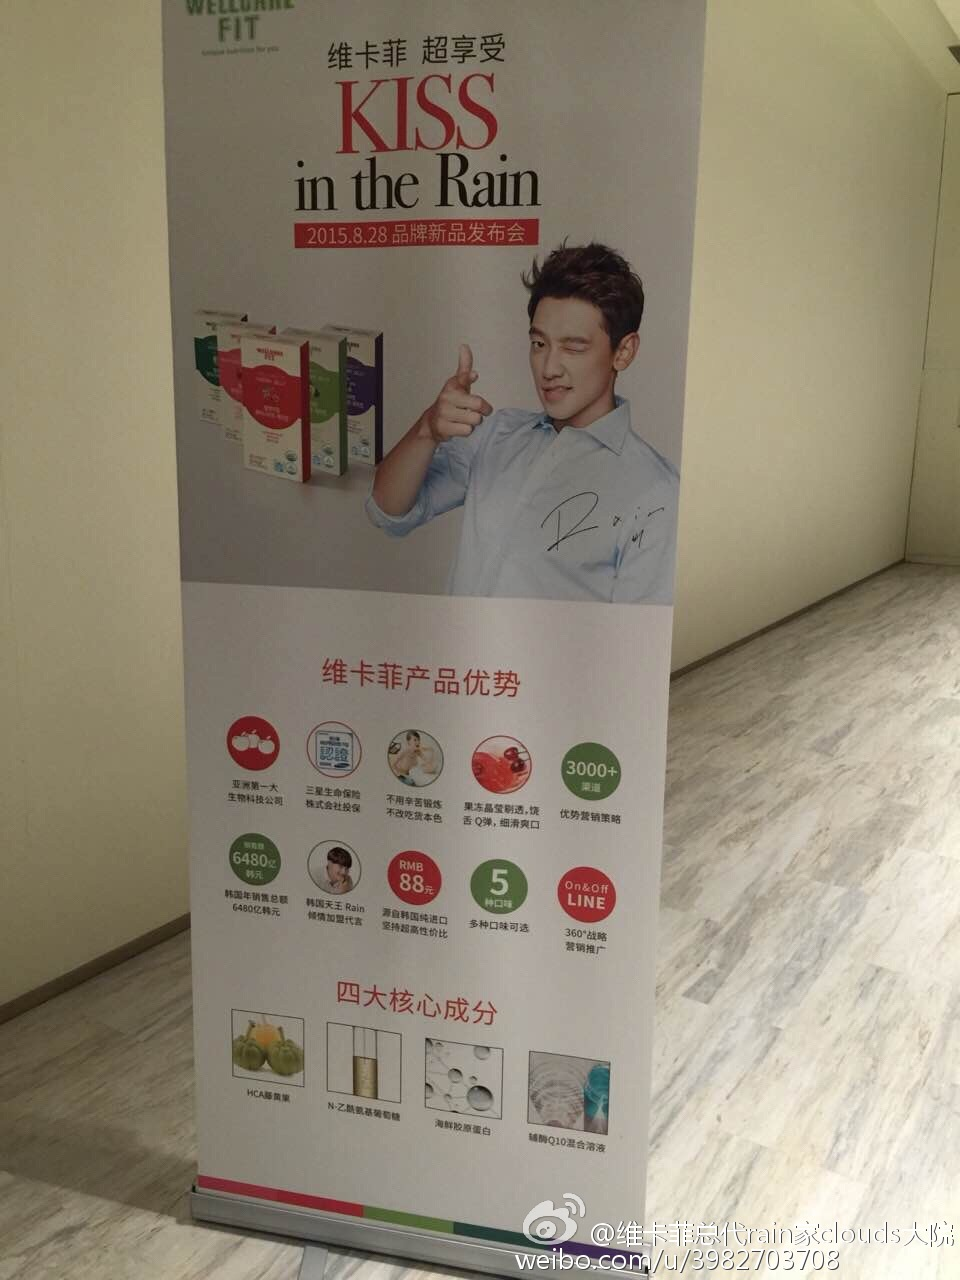 Rain 8月28日上海の wellcarefit イベント_c0047605_7474816.jpg